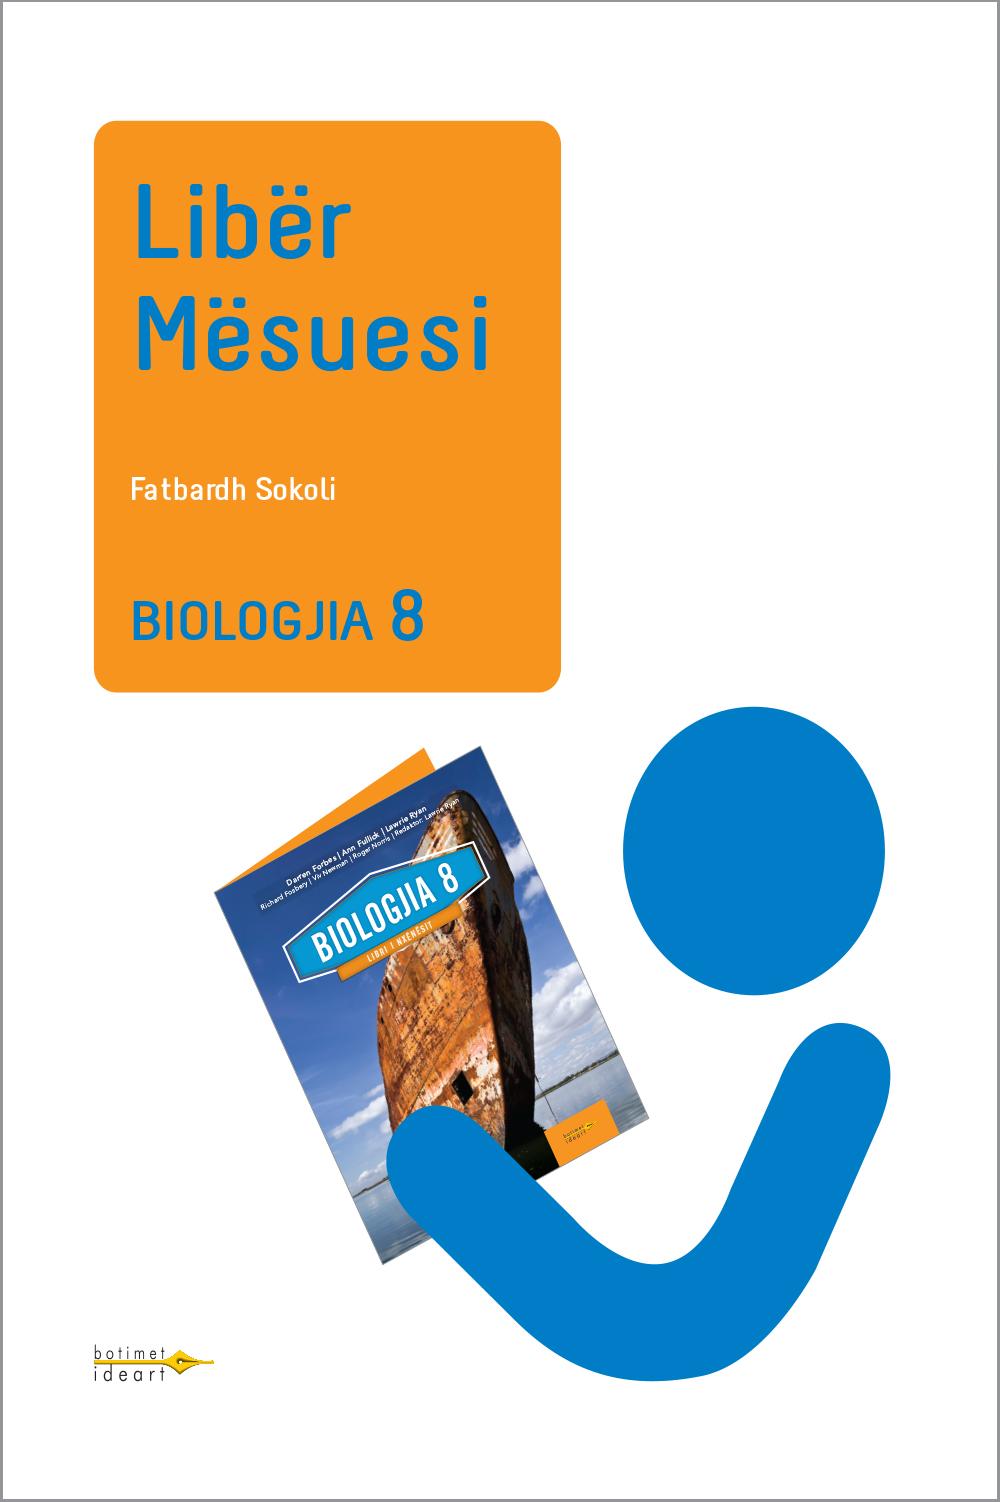 Biologjia 8<br>Libër Mësuesi